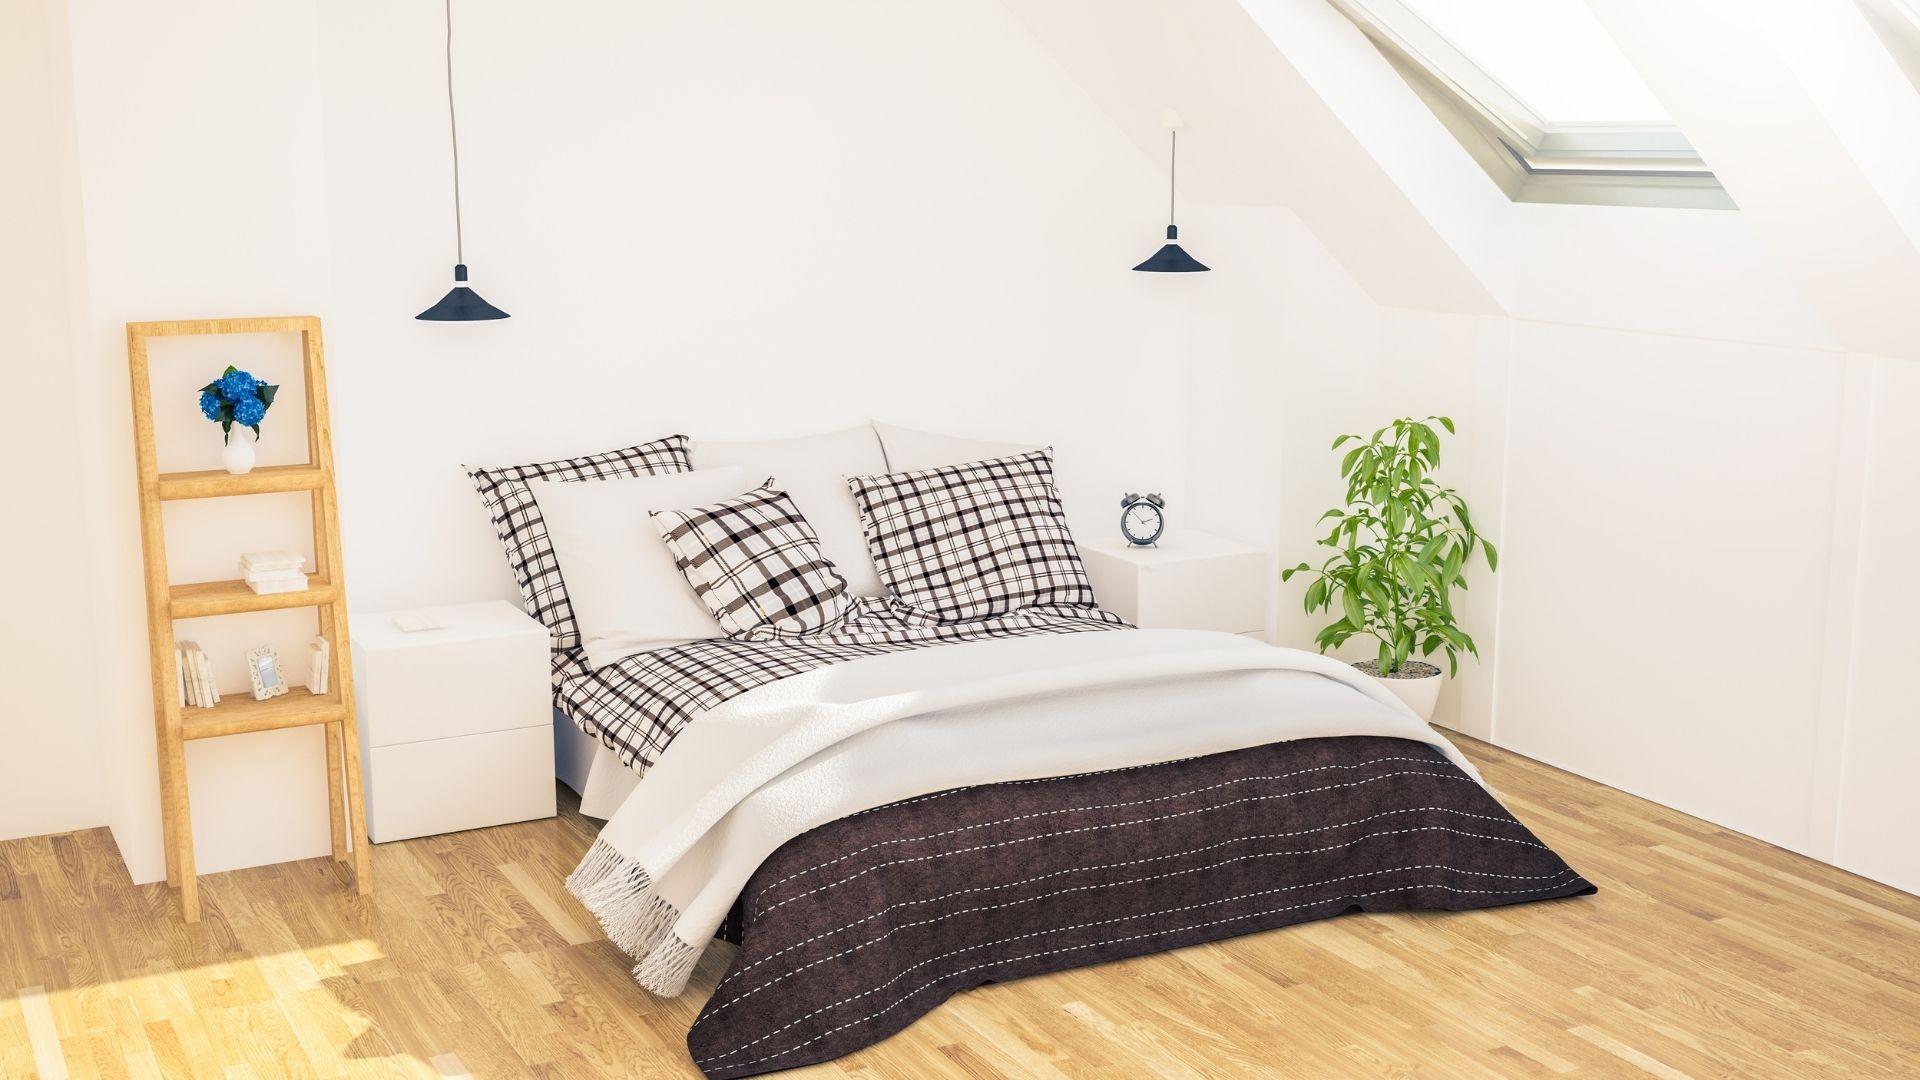 sypialnia na niskim poddaszu ze skosami